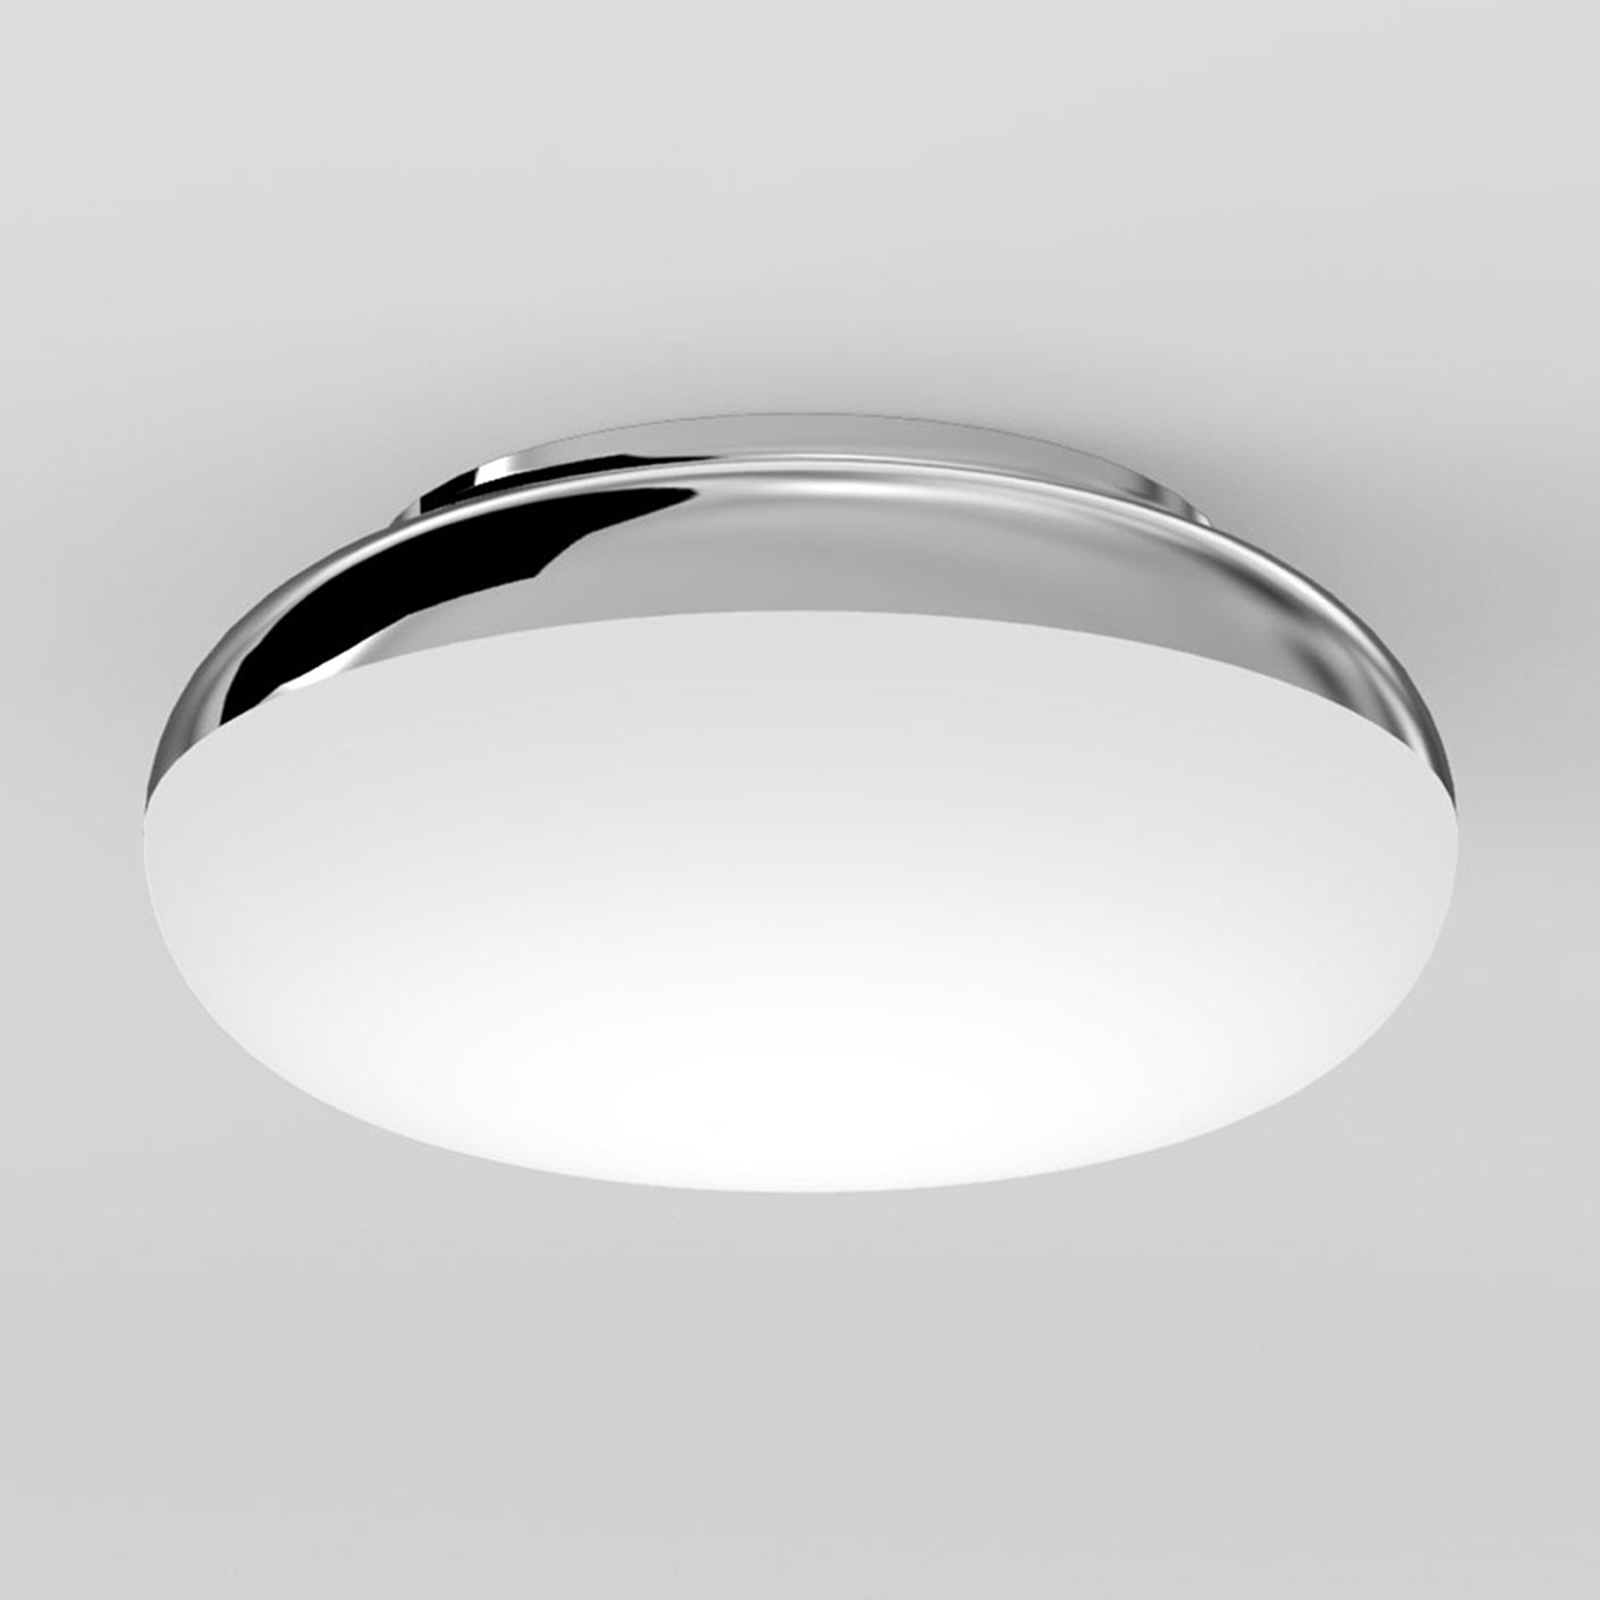 Astro Altea 150 - lampa sufitowa LED Ø 15 cm